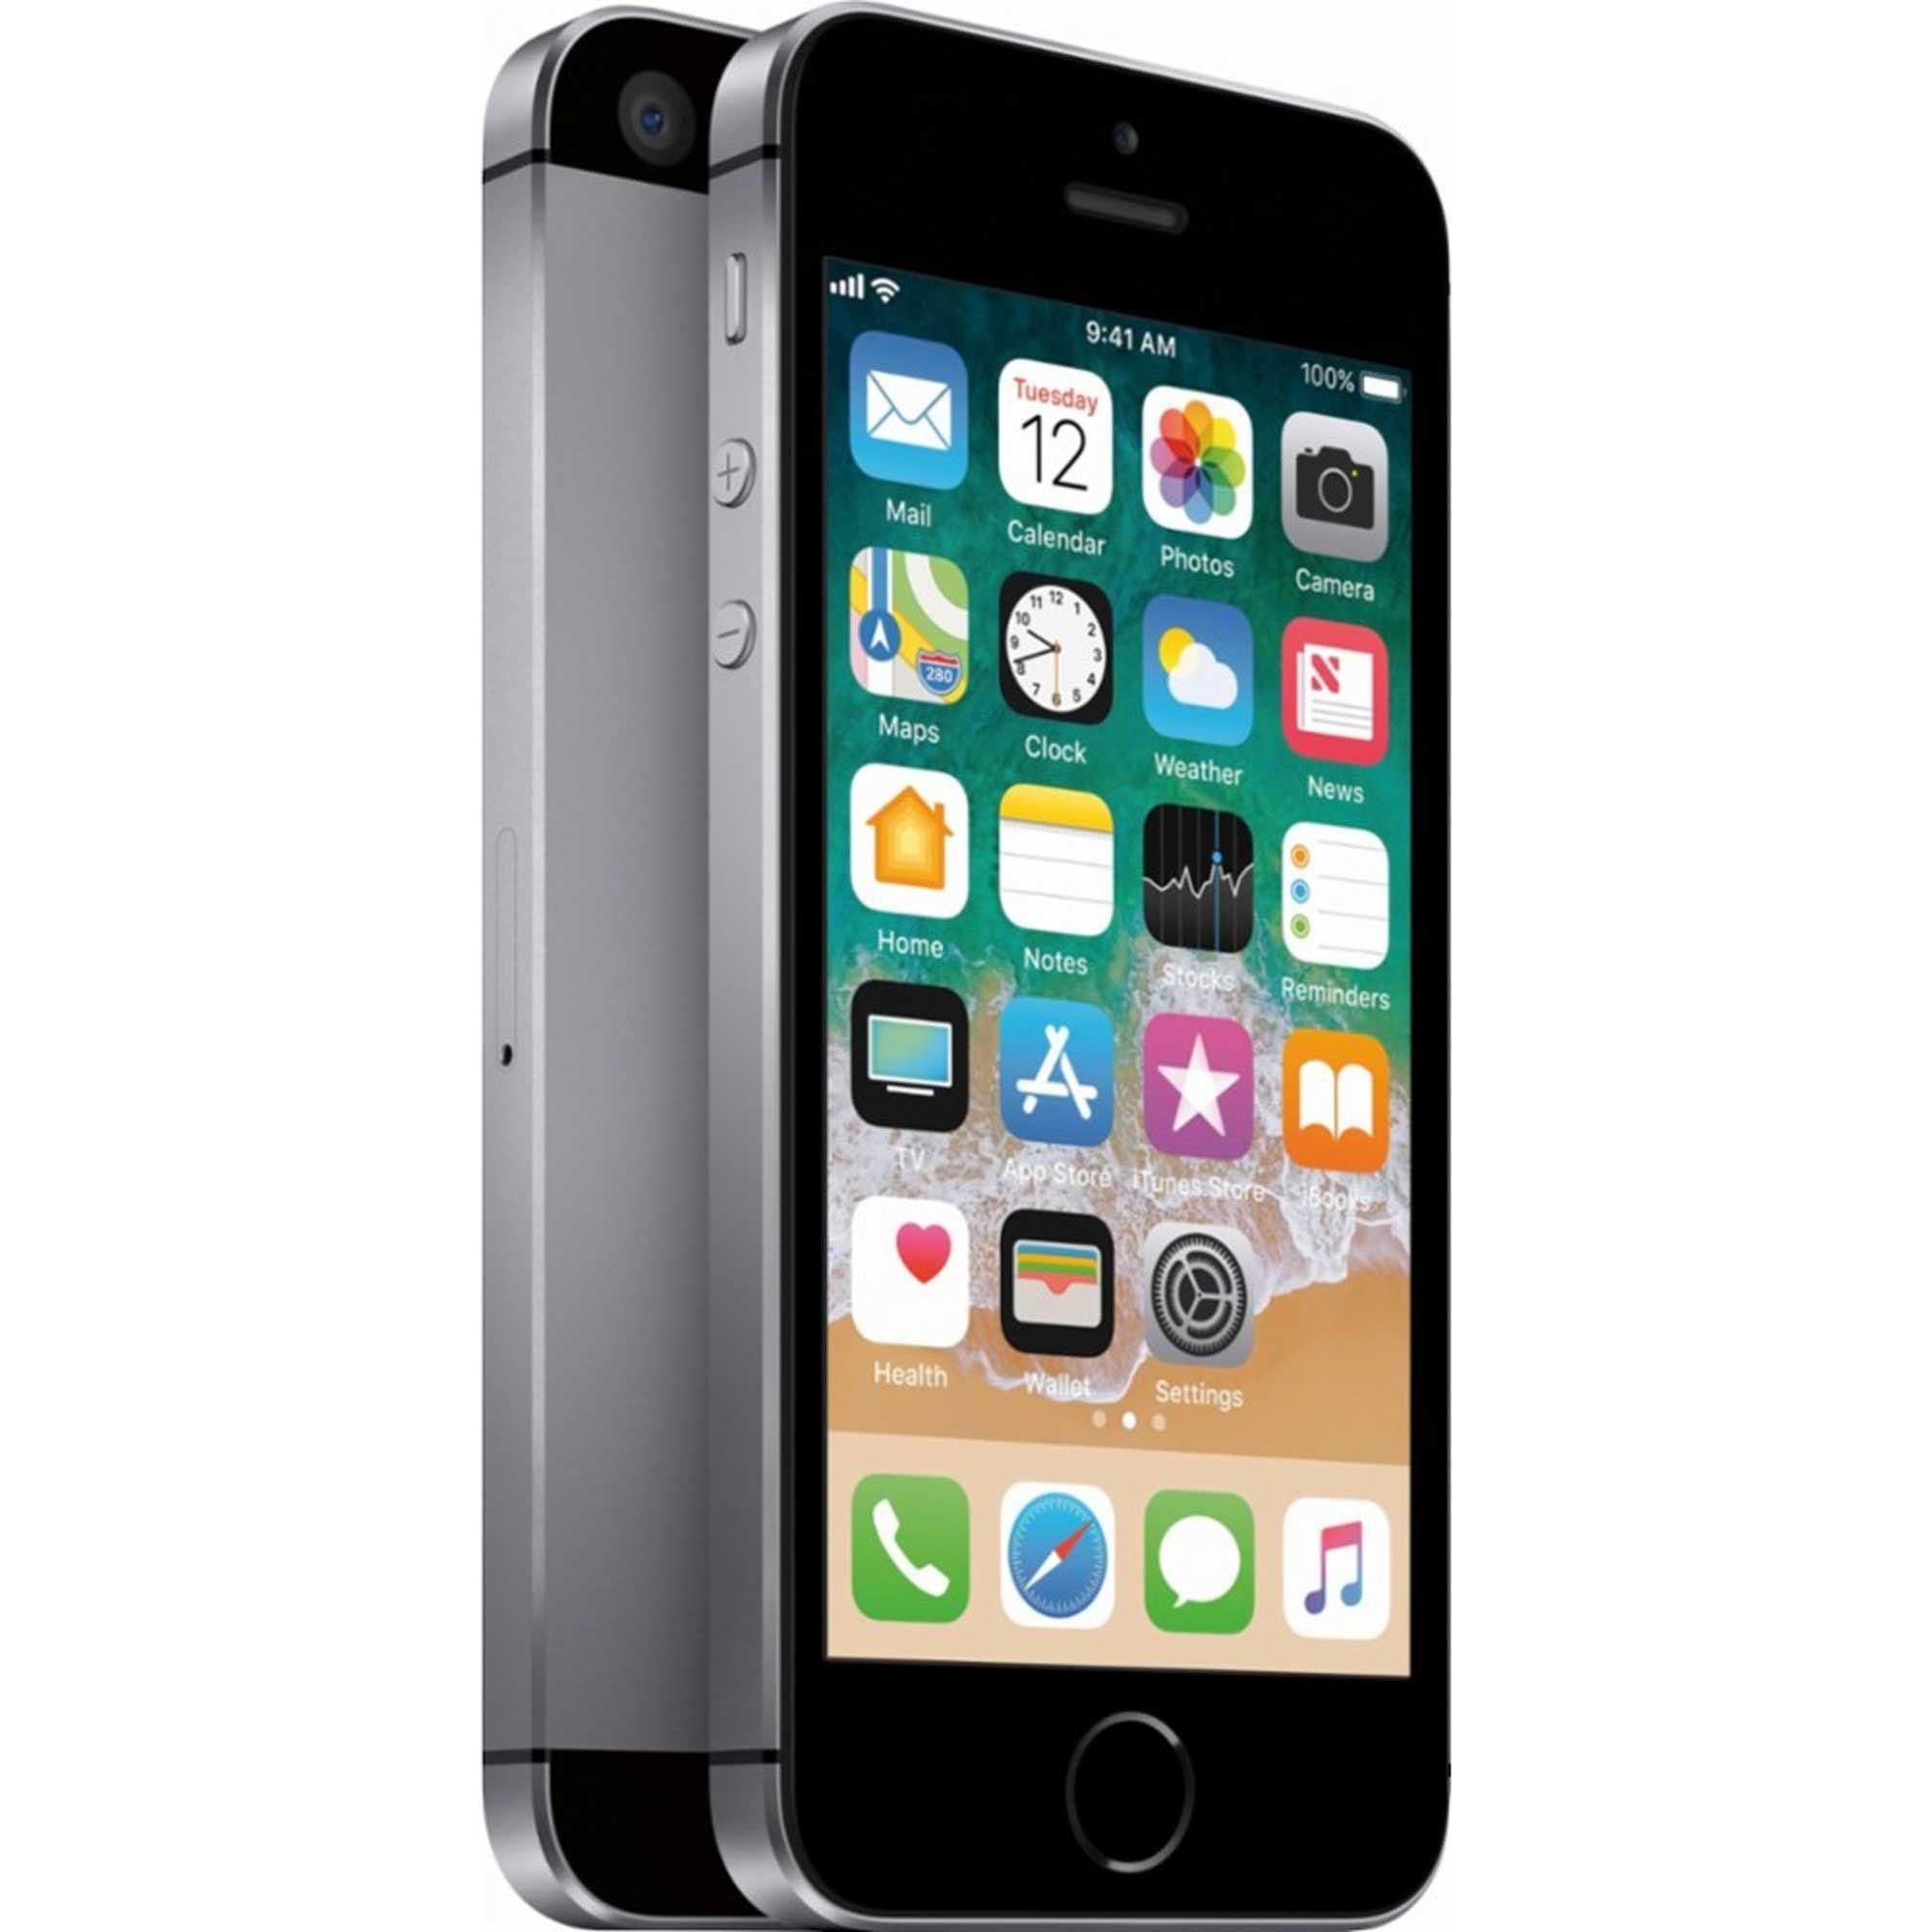 Begagnad iPhone 5 - Mobidora.se - Begagnade mobiltelefoner på nätet